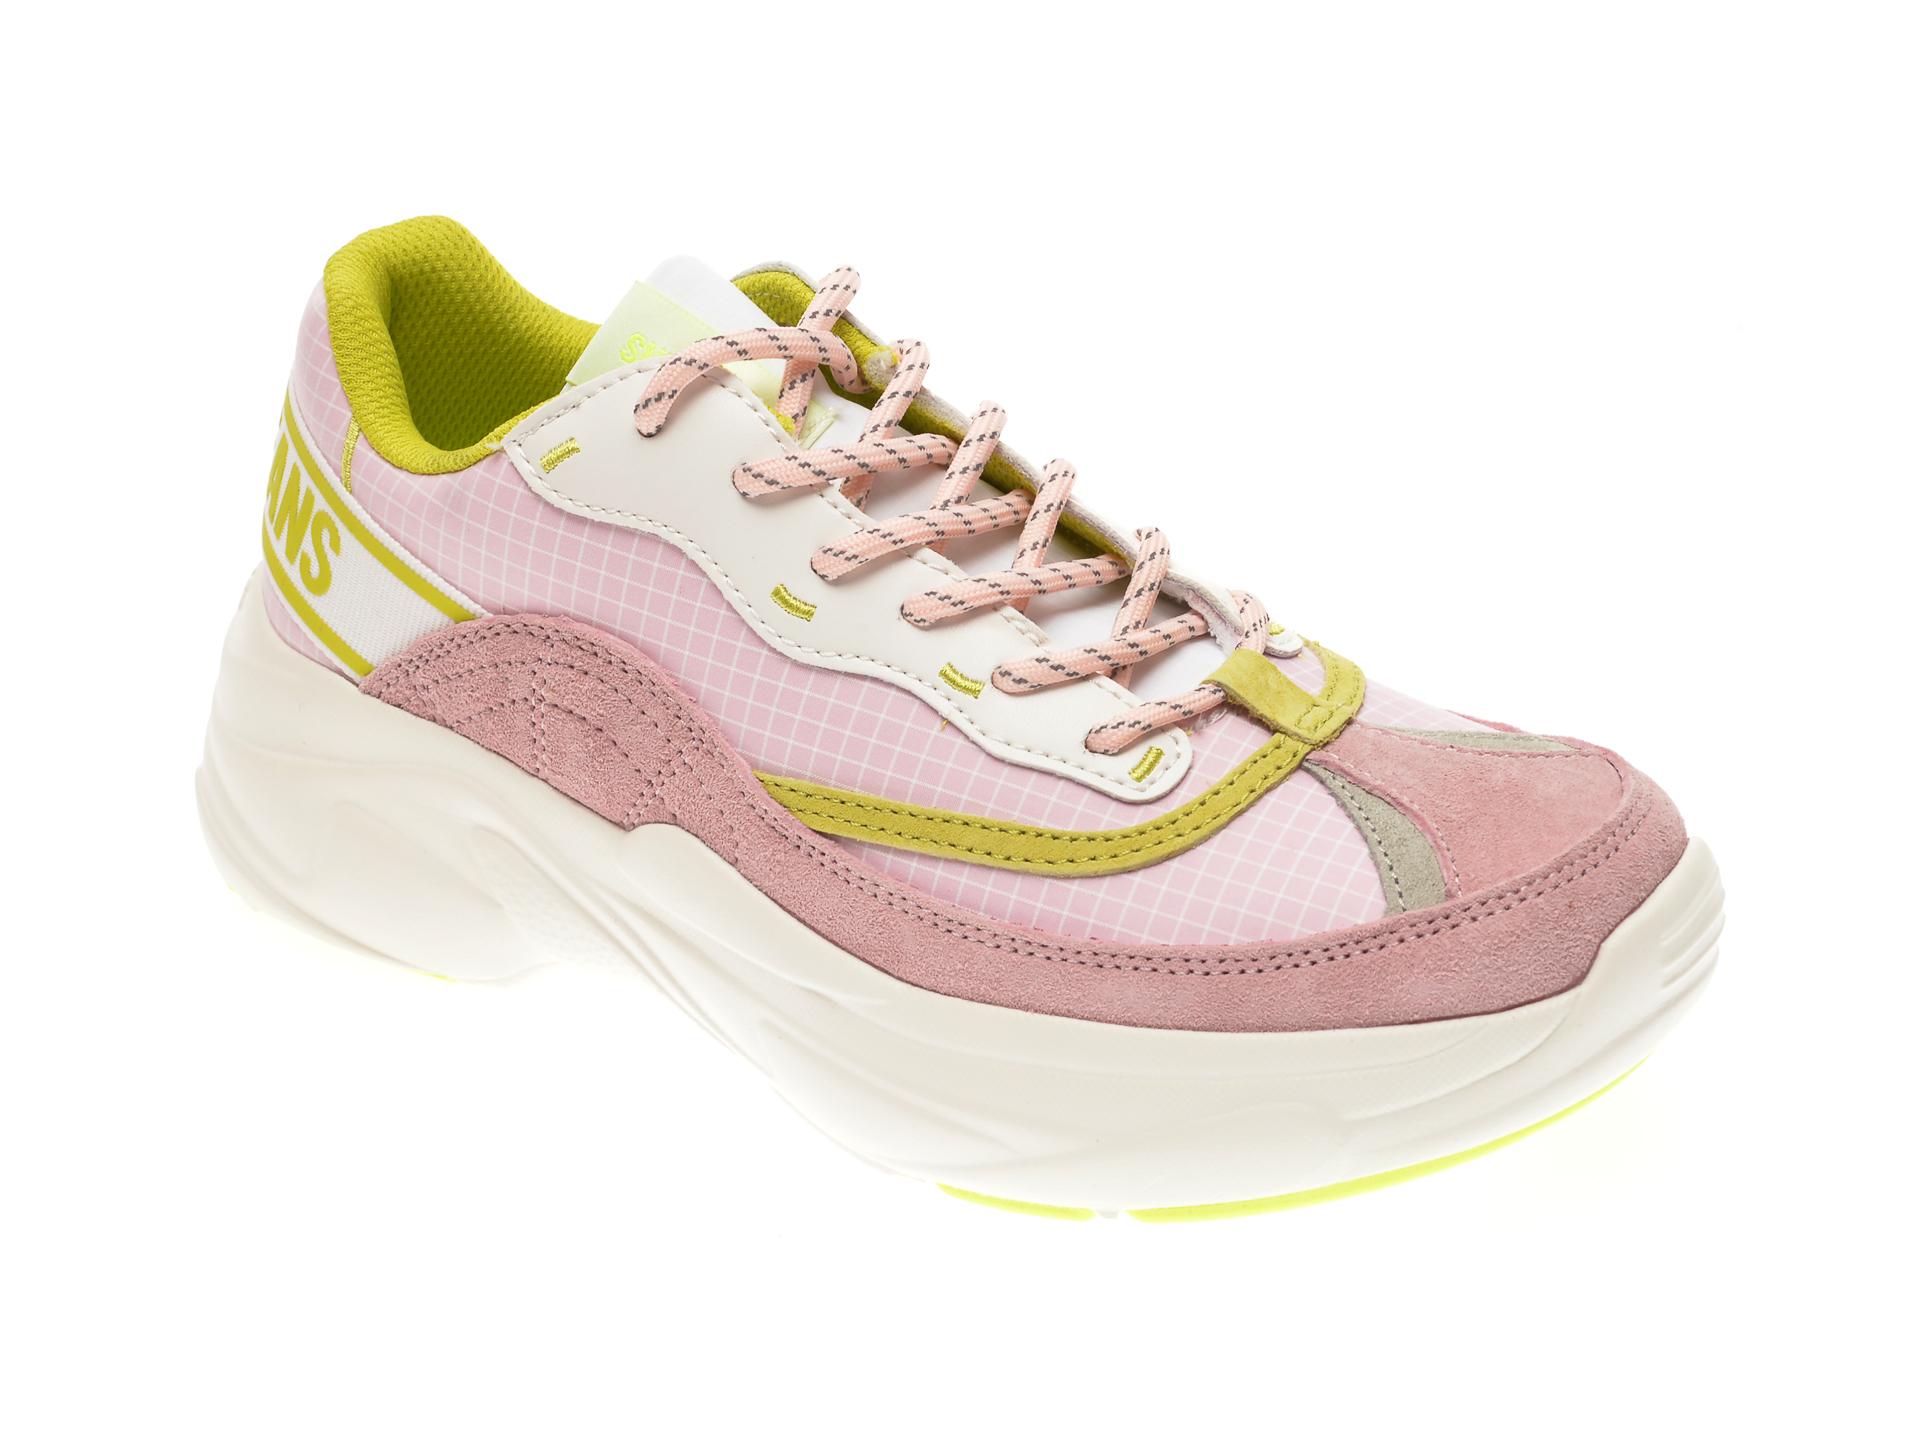 Pantofi sport PEPE JEANS roz, LS30988, din material textil si piele naturala